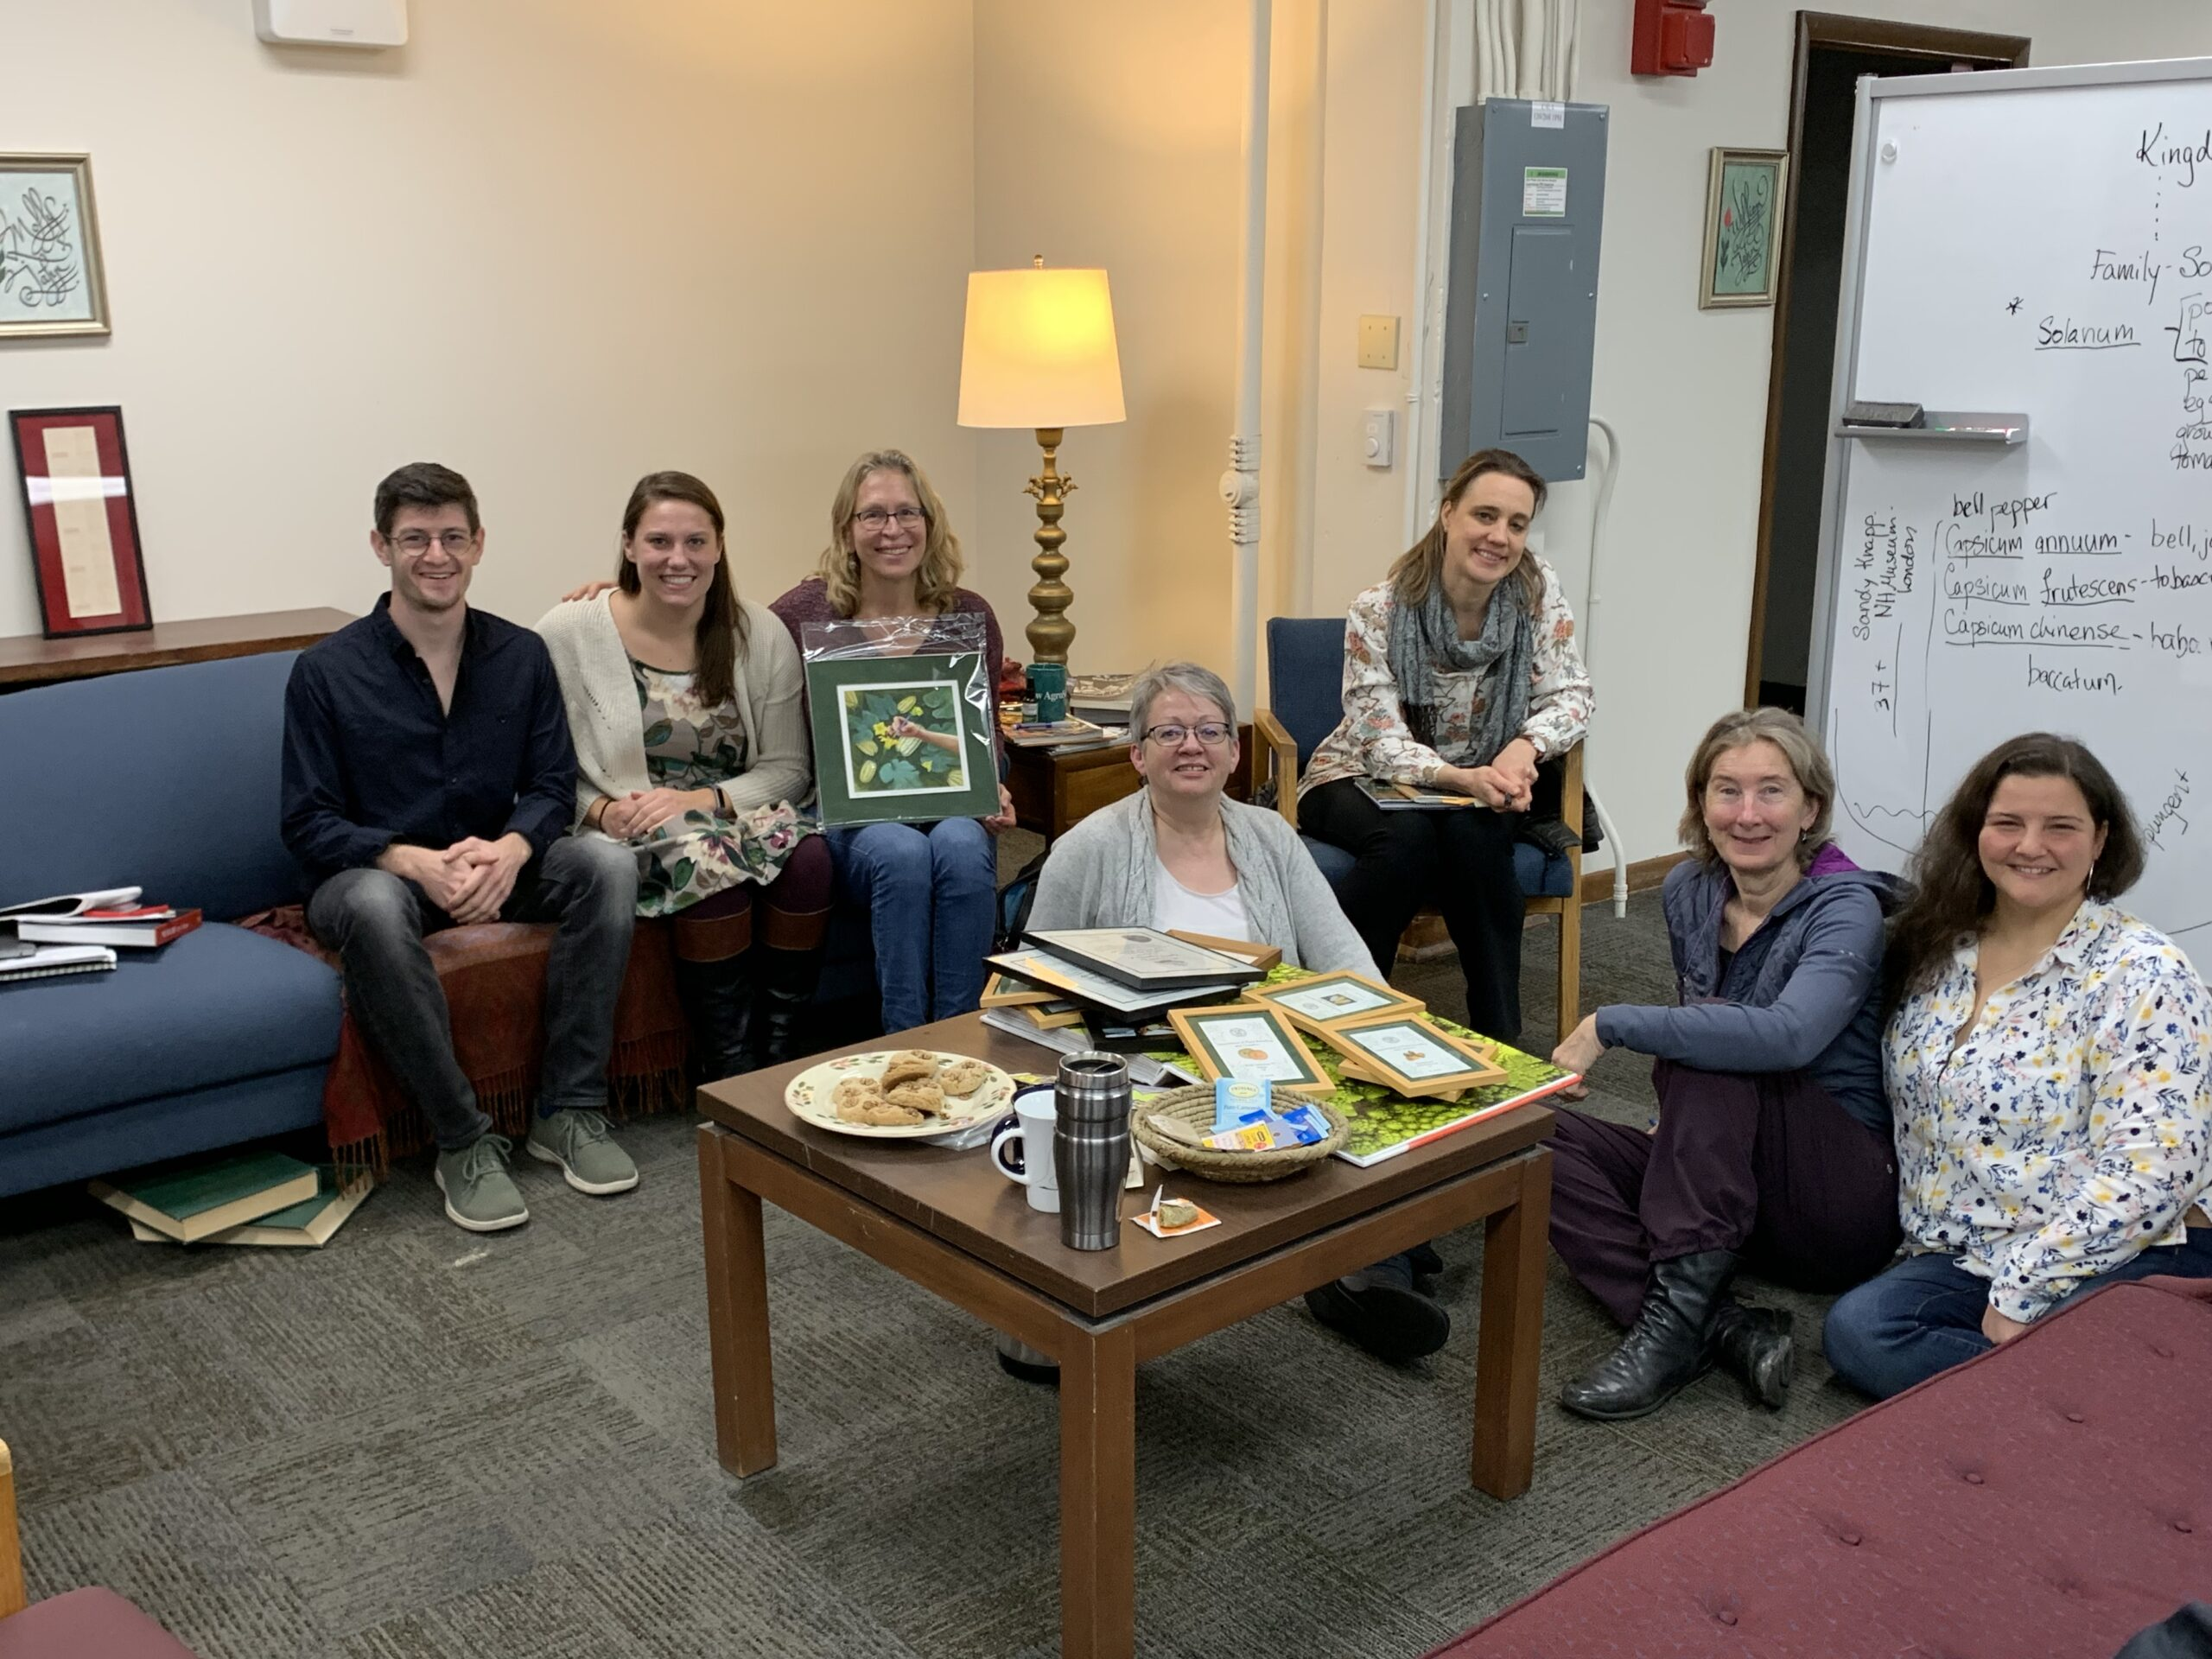 Taliesin group visits Jahn Research Group, Molly Jahn